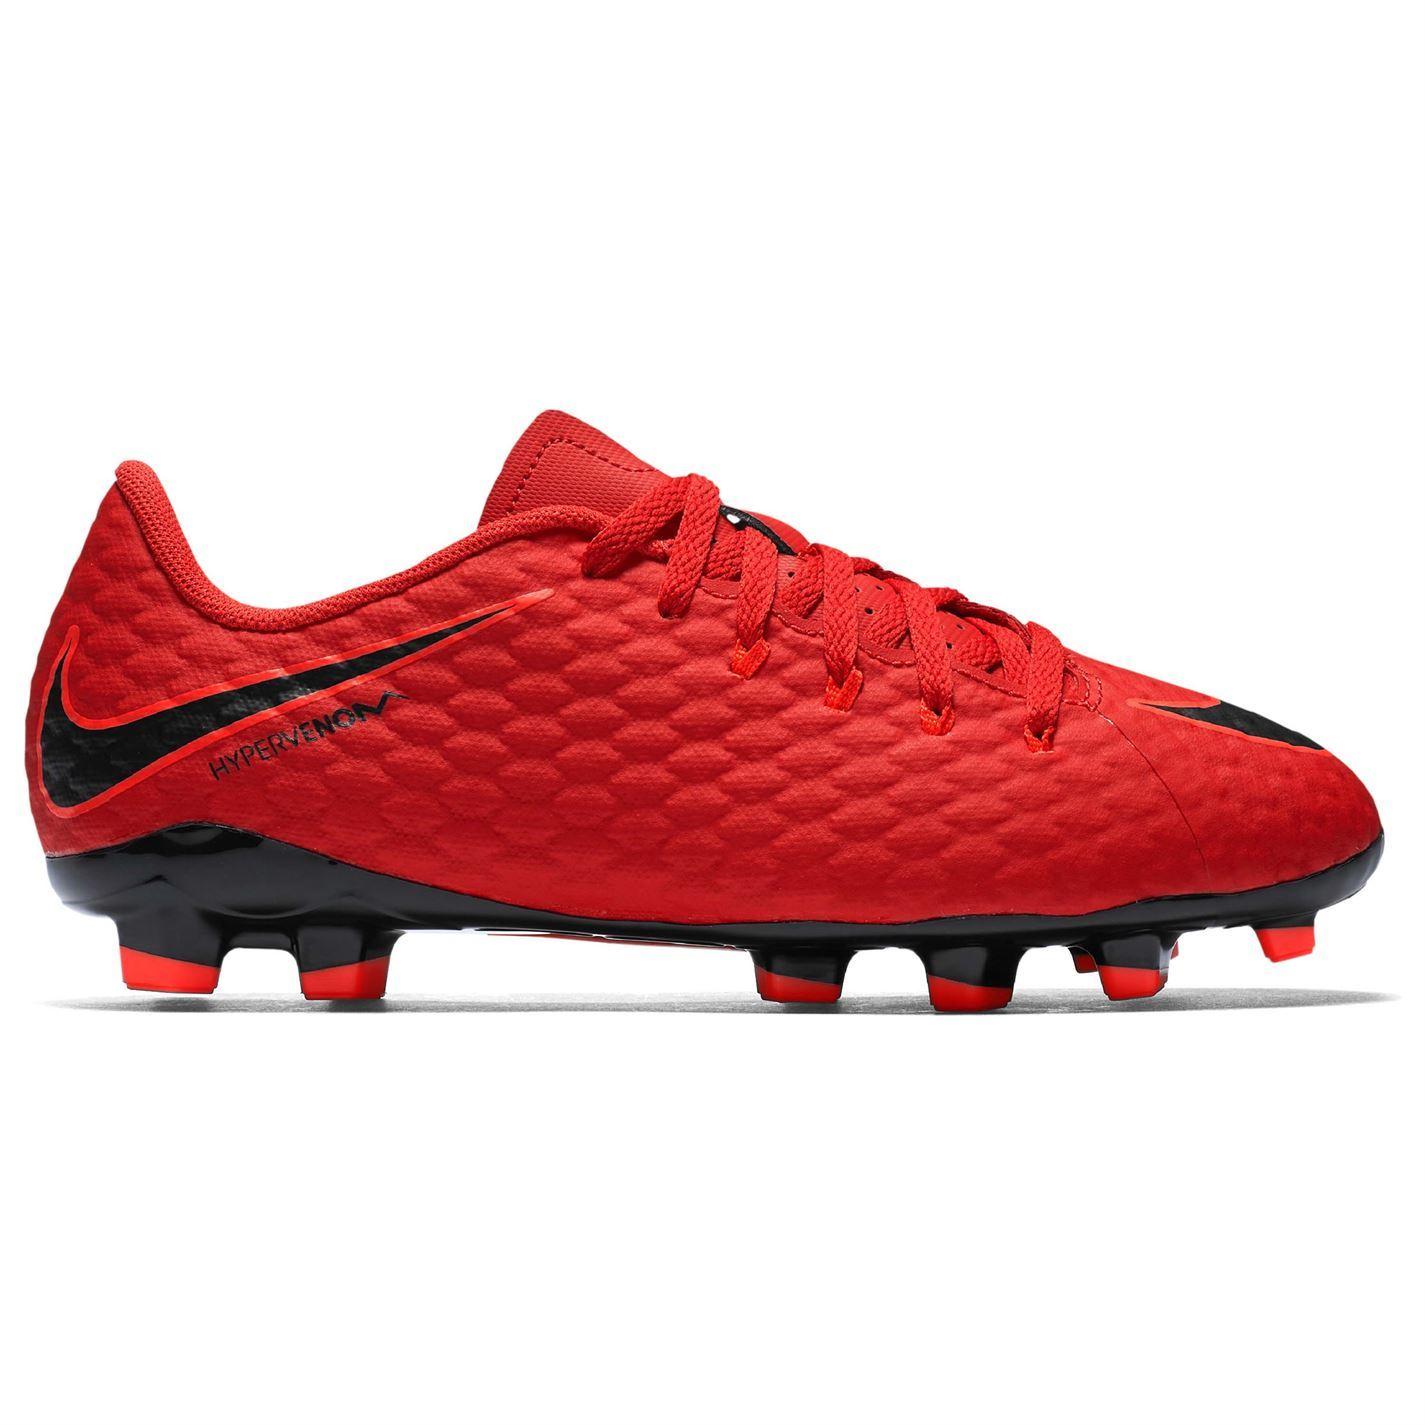 68946cb6 Nike Hypervenom Phelon FG Firm Ground Football Boots Juniors Red Soccer  Cleats